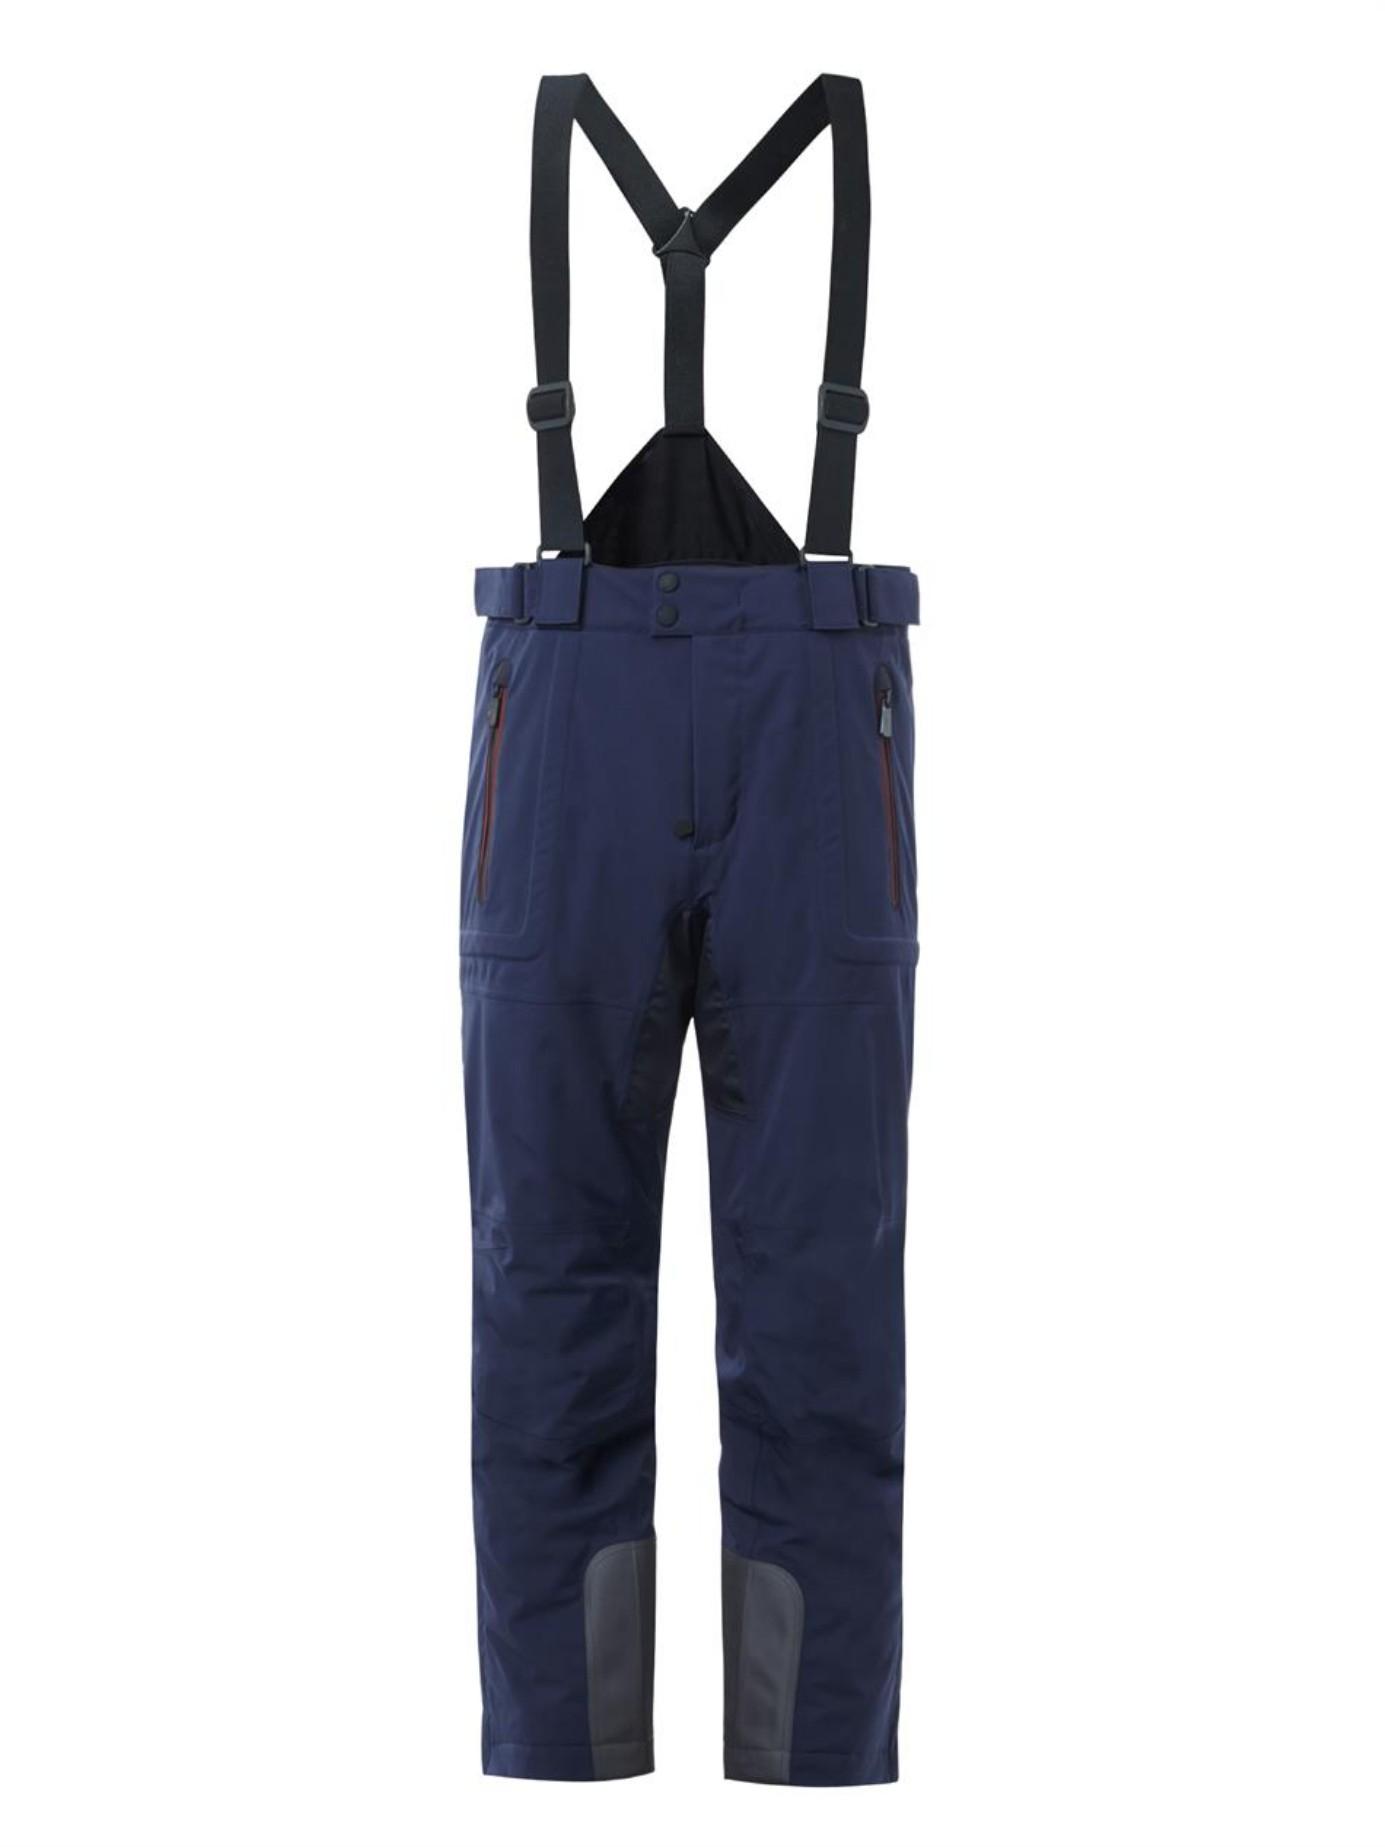 1eb0f4985f Lyst - Moncler Grenoble Recco Salopette Ski Trousers in Blue for Men